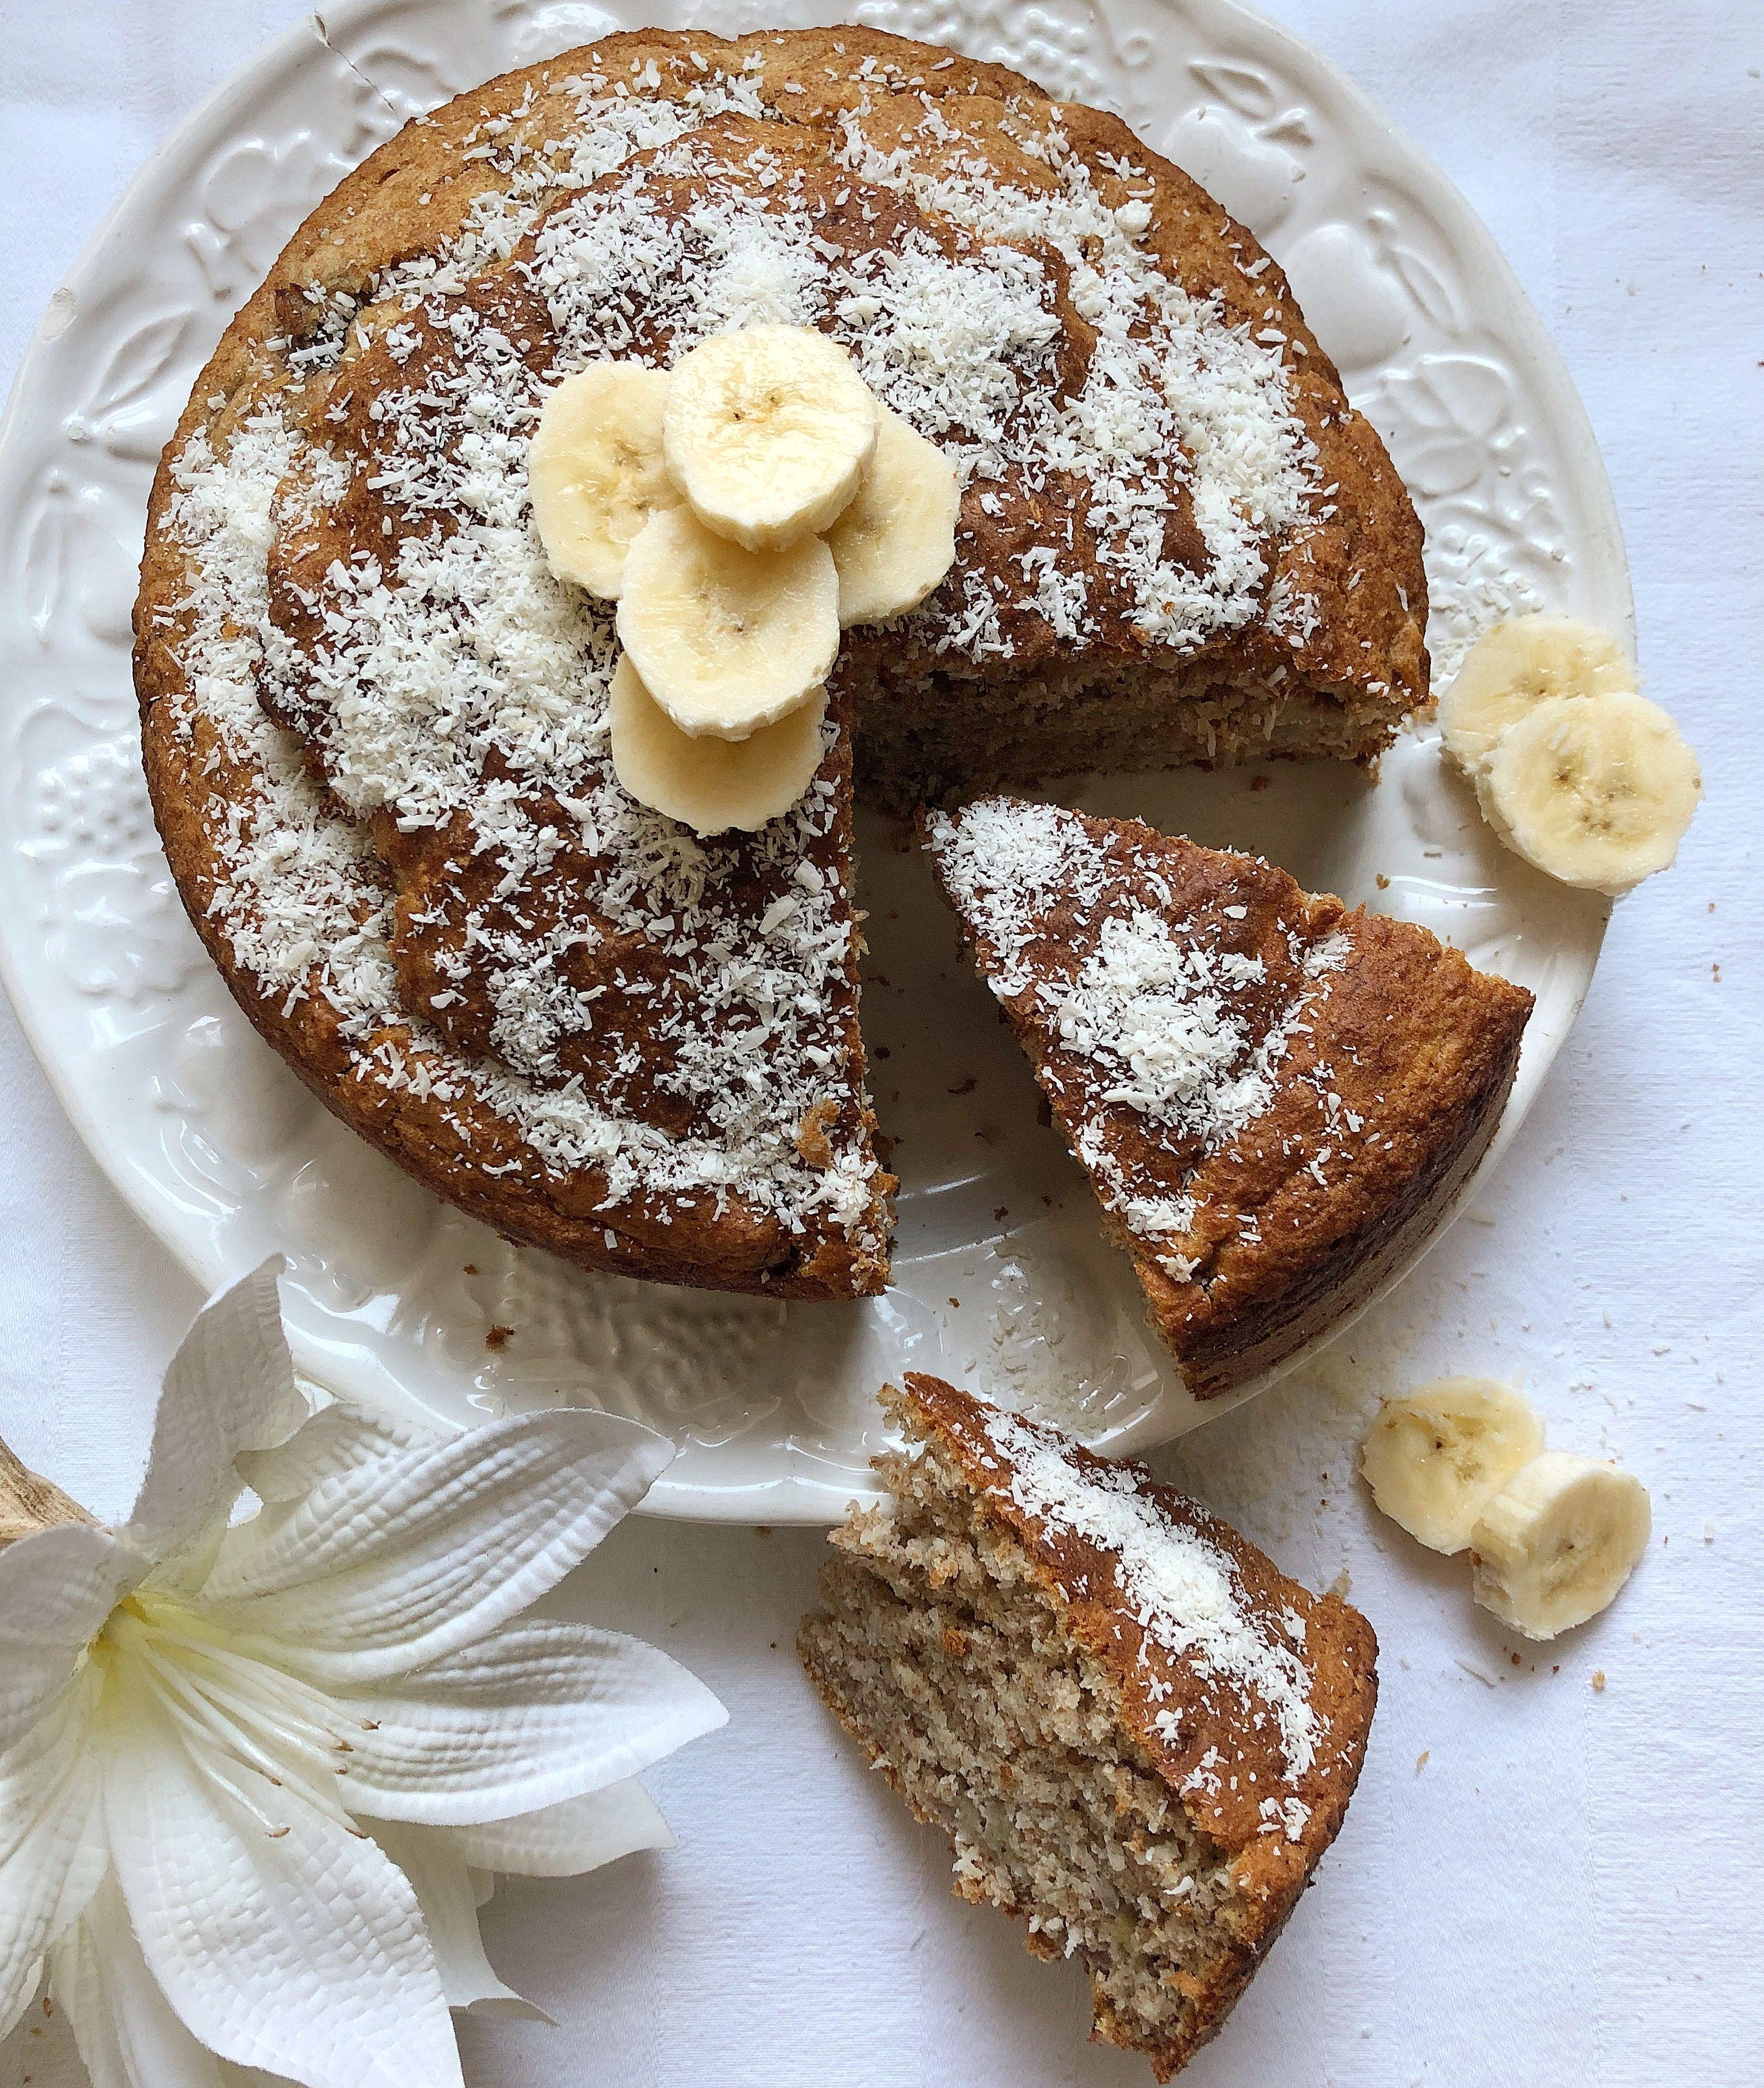 Dolci Senza Burro E Uova.Torta Di Banane E Cocco Senza Burro E Uova Nel 2019 Vegan